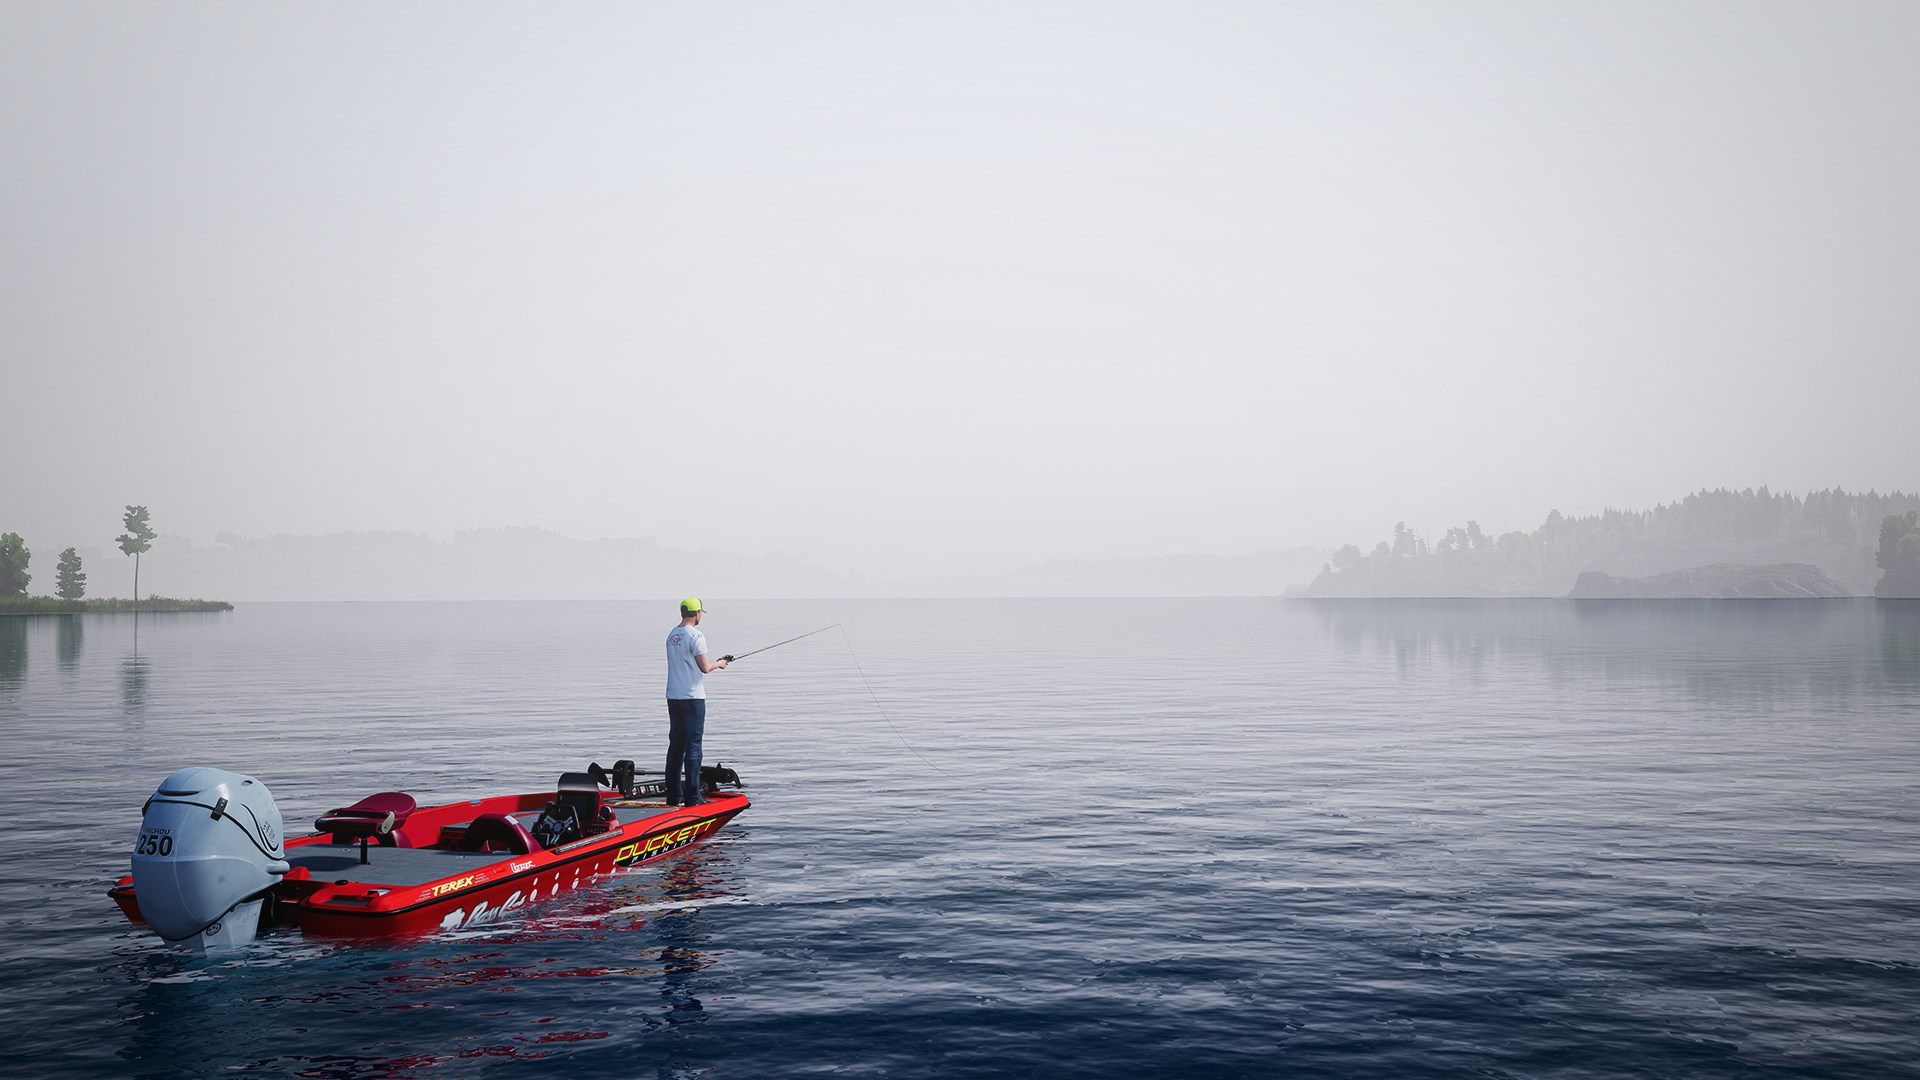 Fishing Sim World®: Pro Tour – Trophy Hunter's Equipment Pack